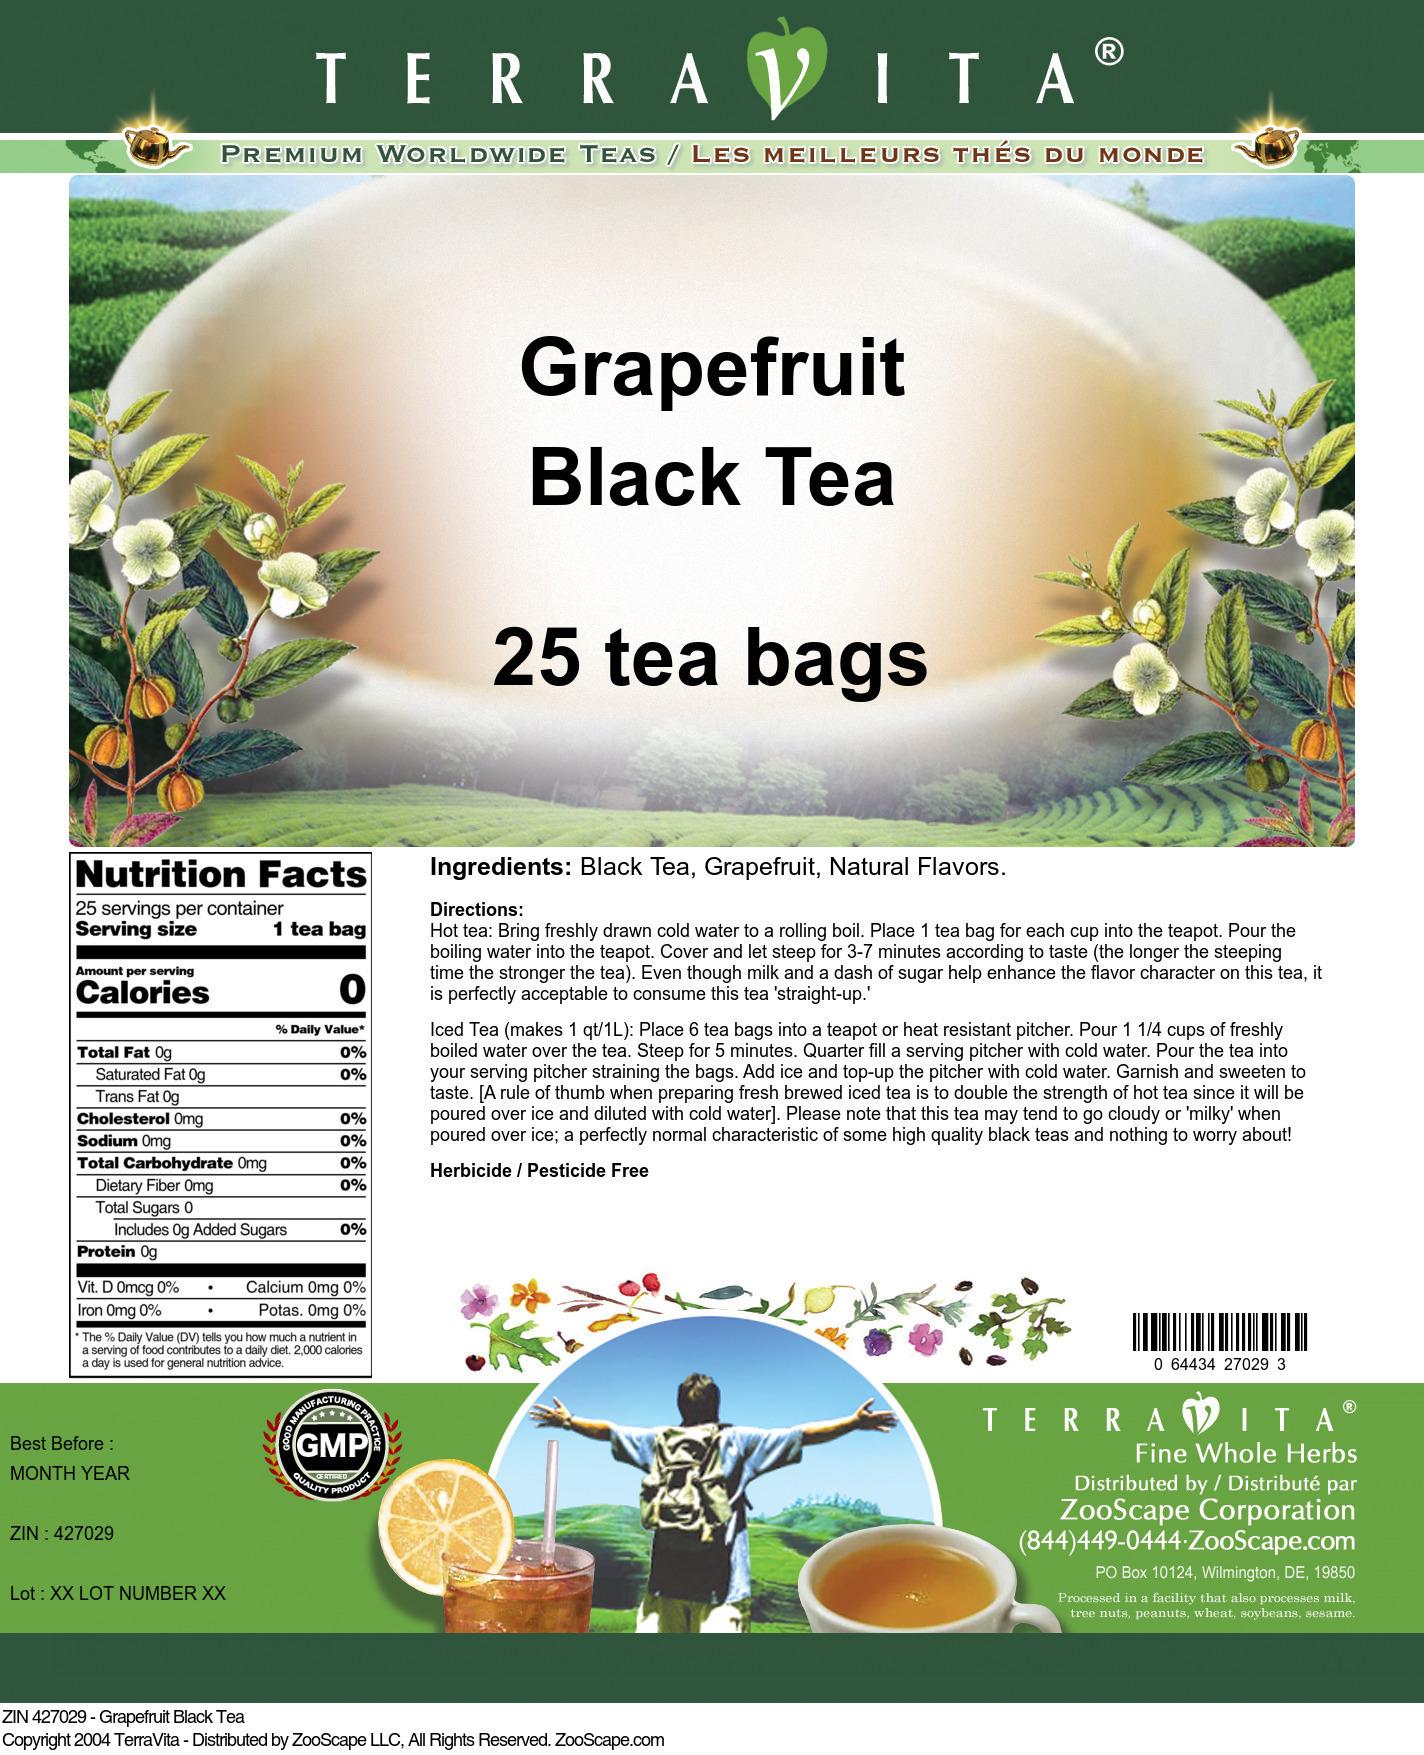 Grapefruit Black Tea - Label